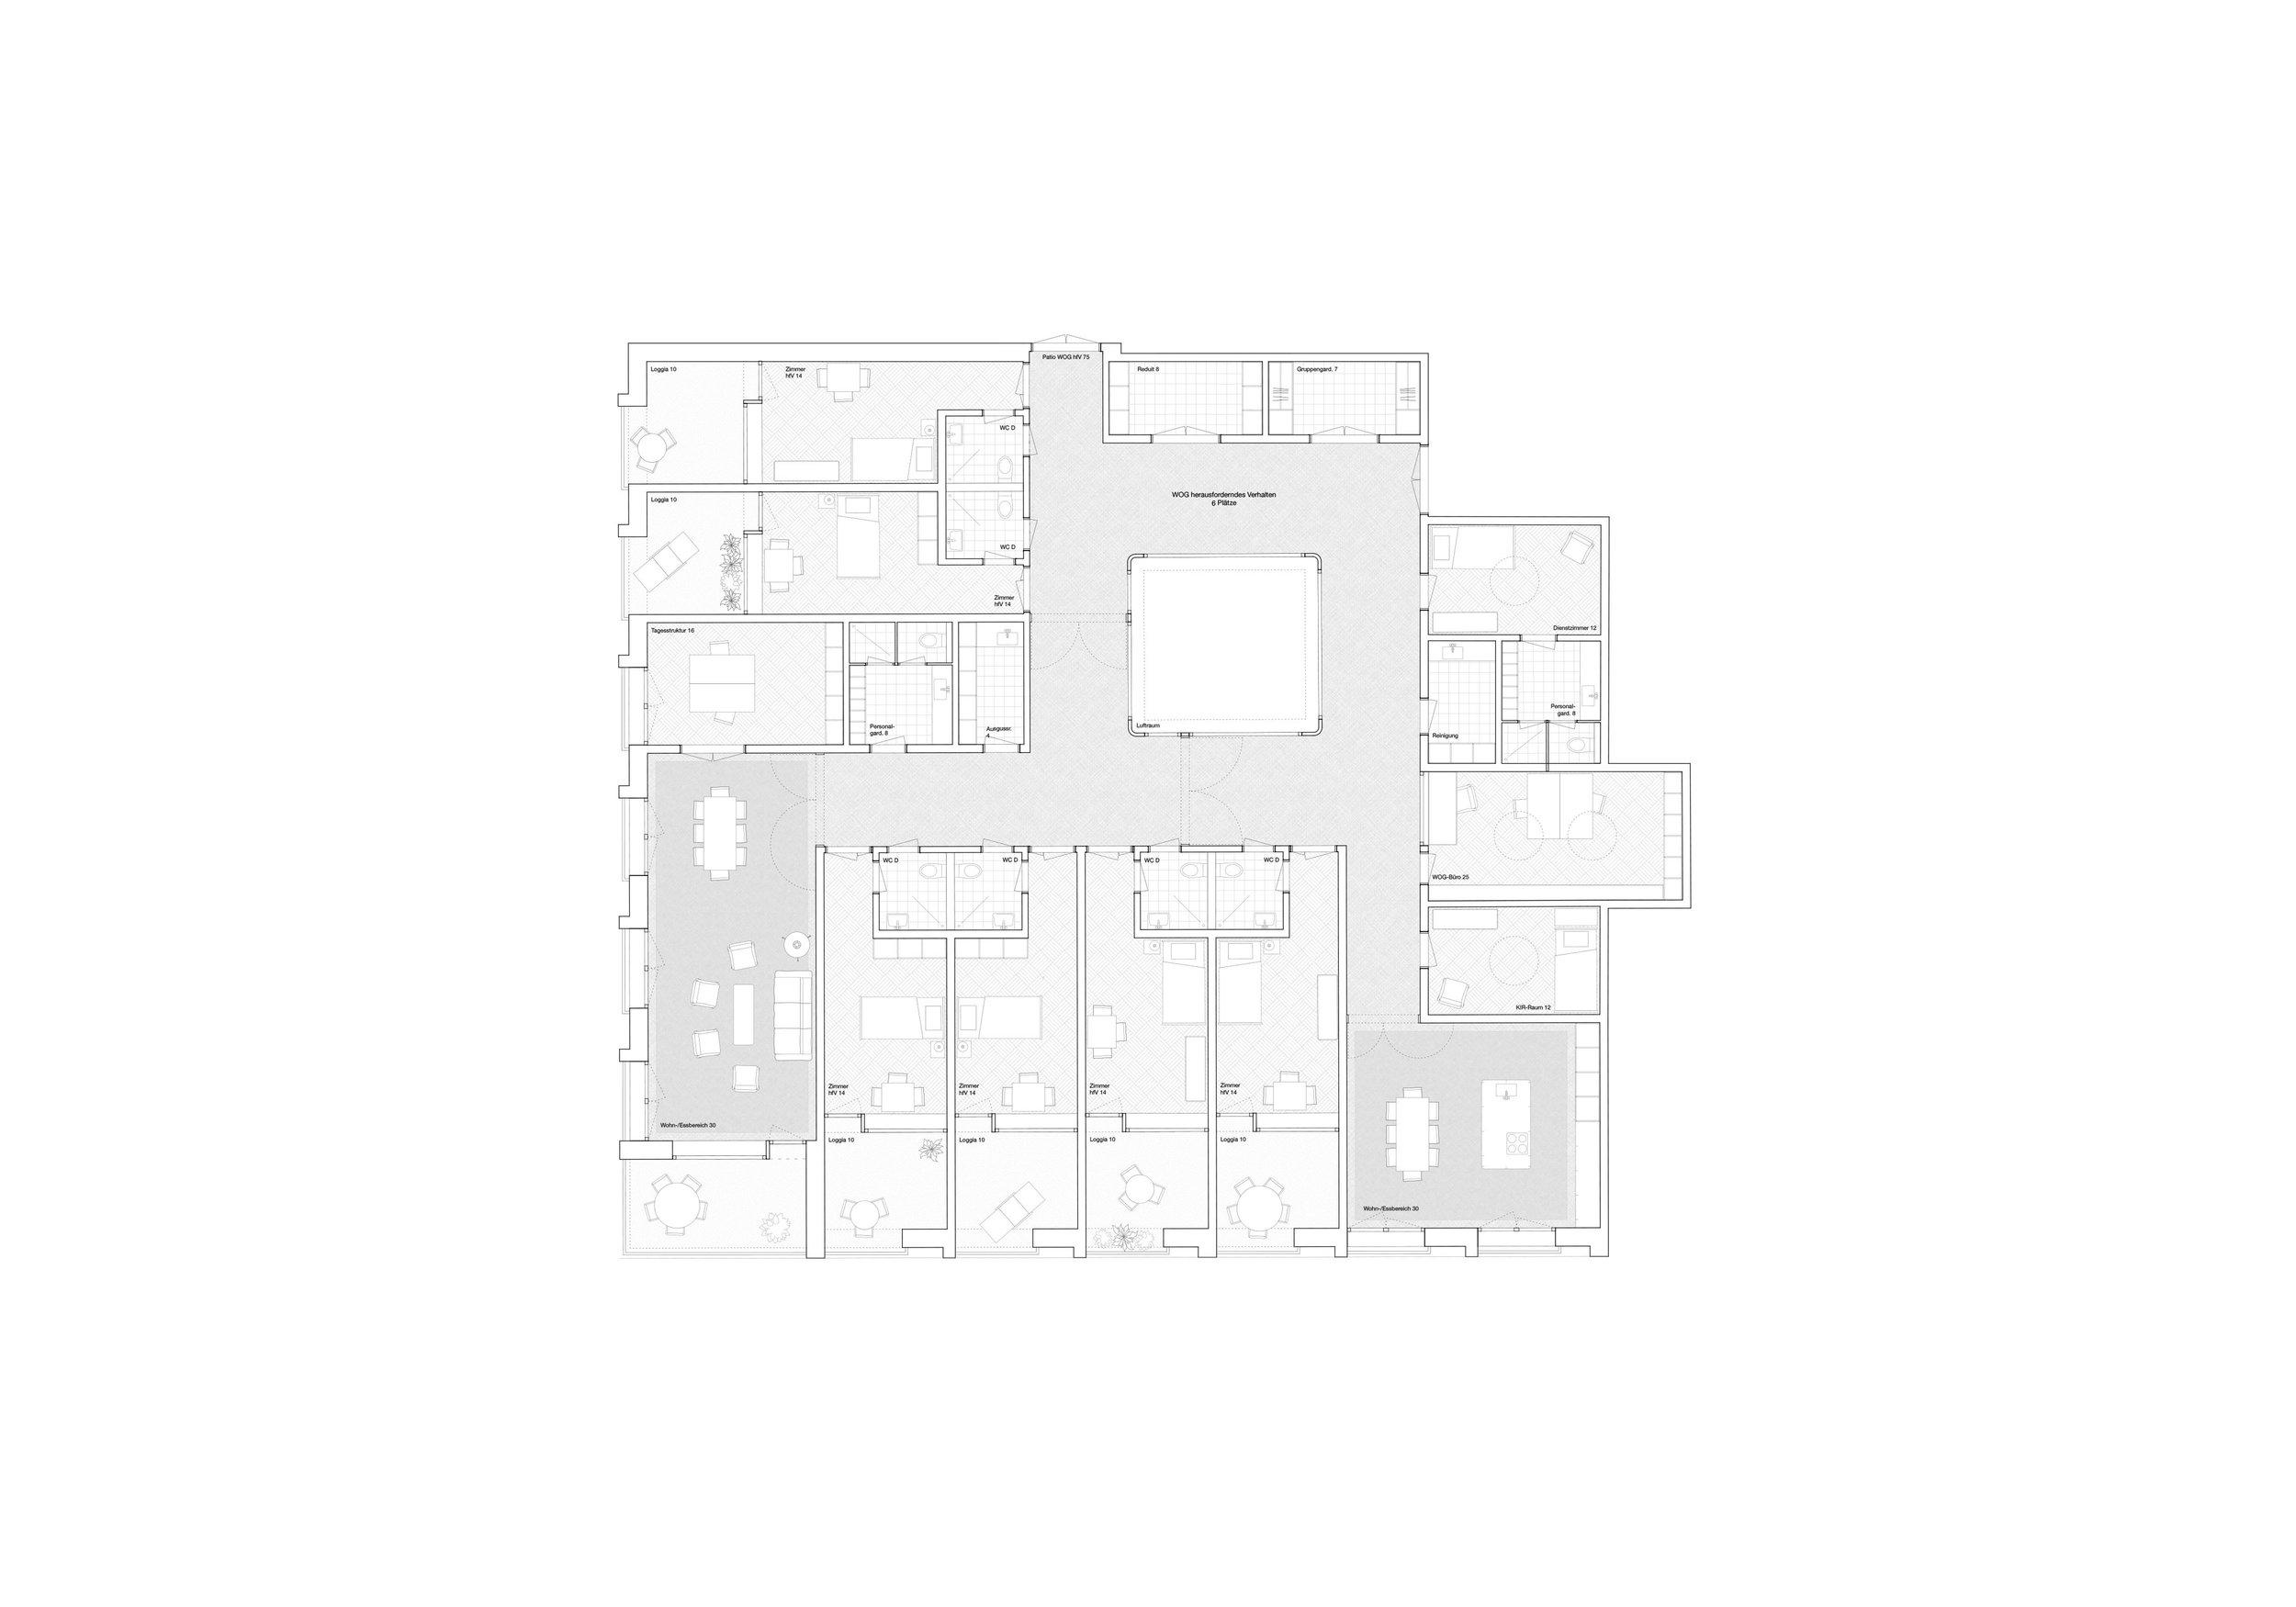 typologie gr 100 1.jpg